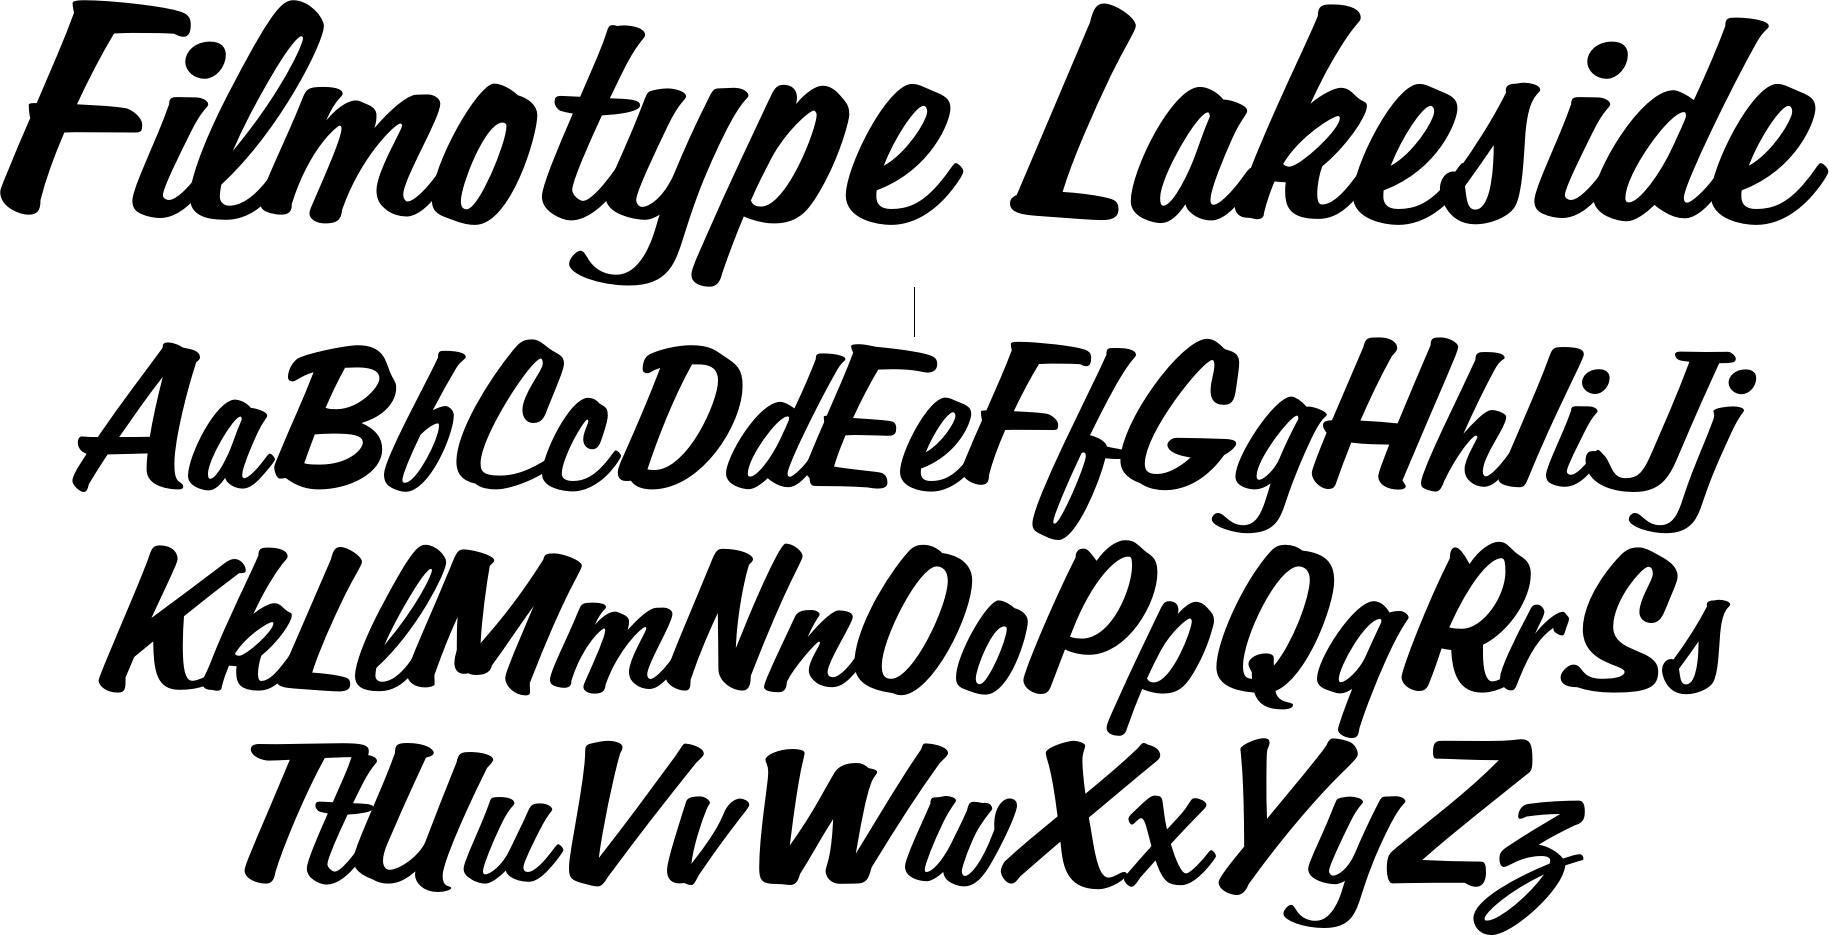 Filmotype Lakeside Font